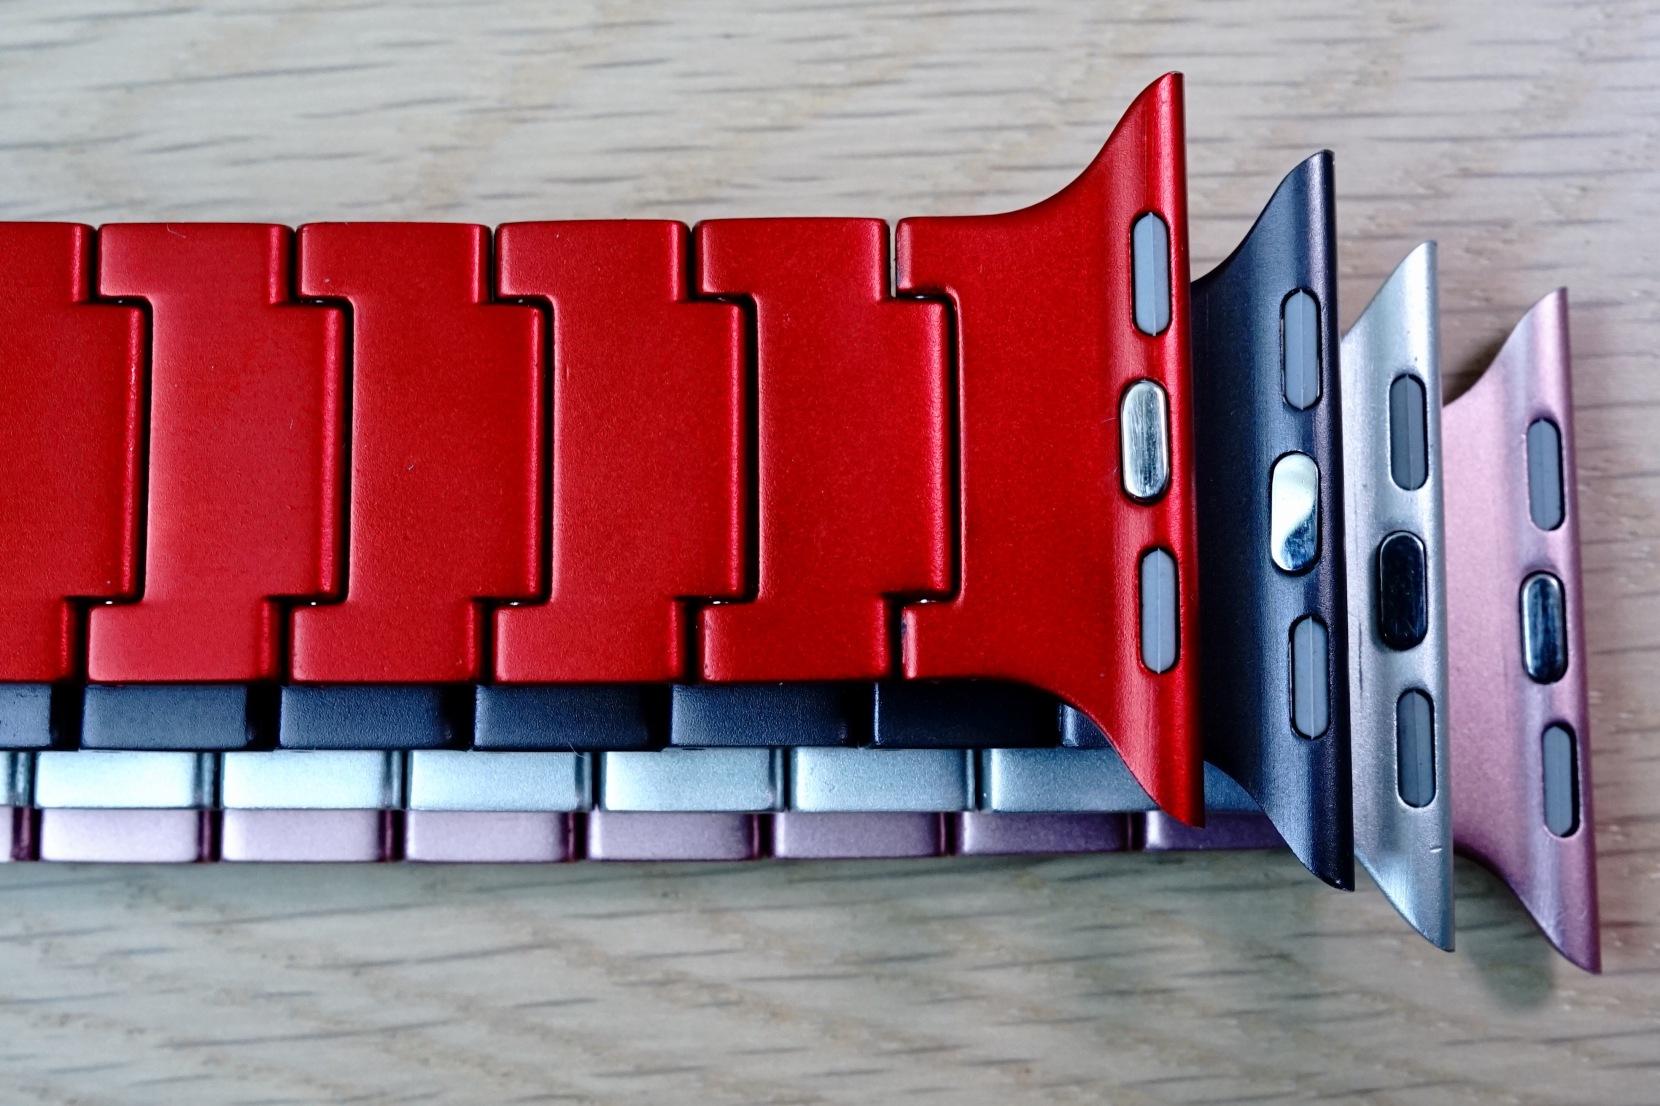 juuk-ligero-aluminum-band-12